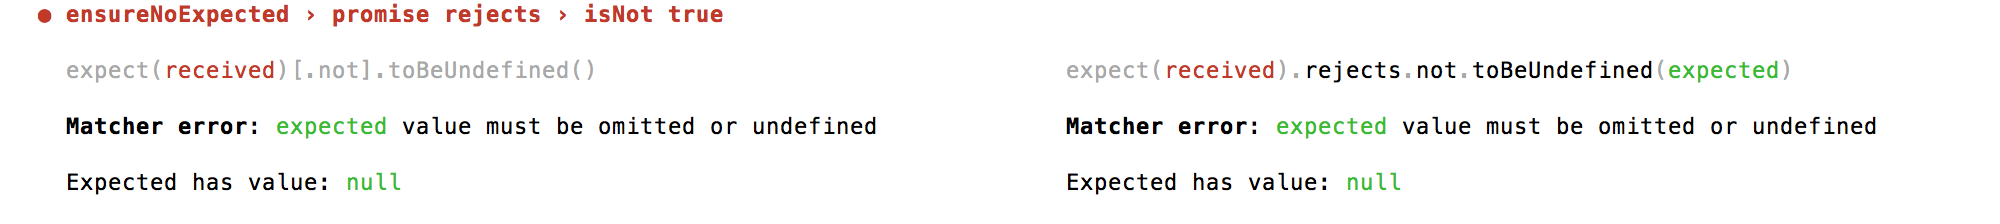 ensurenoexpected-6-rejects-true copy